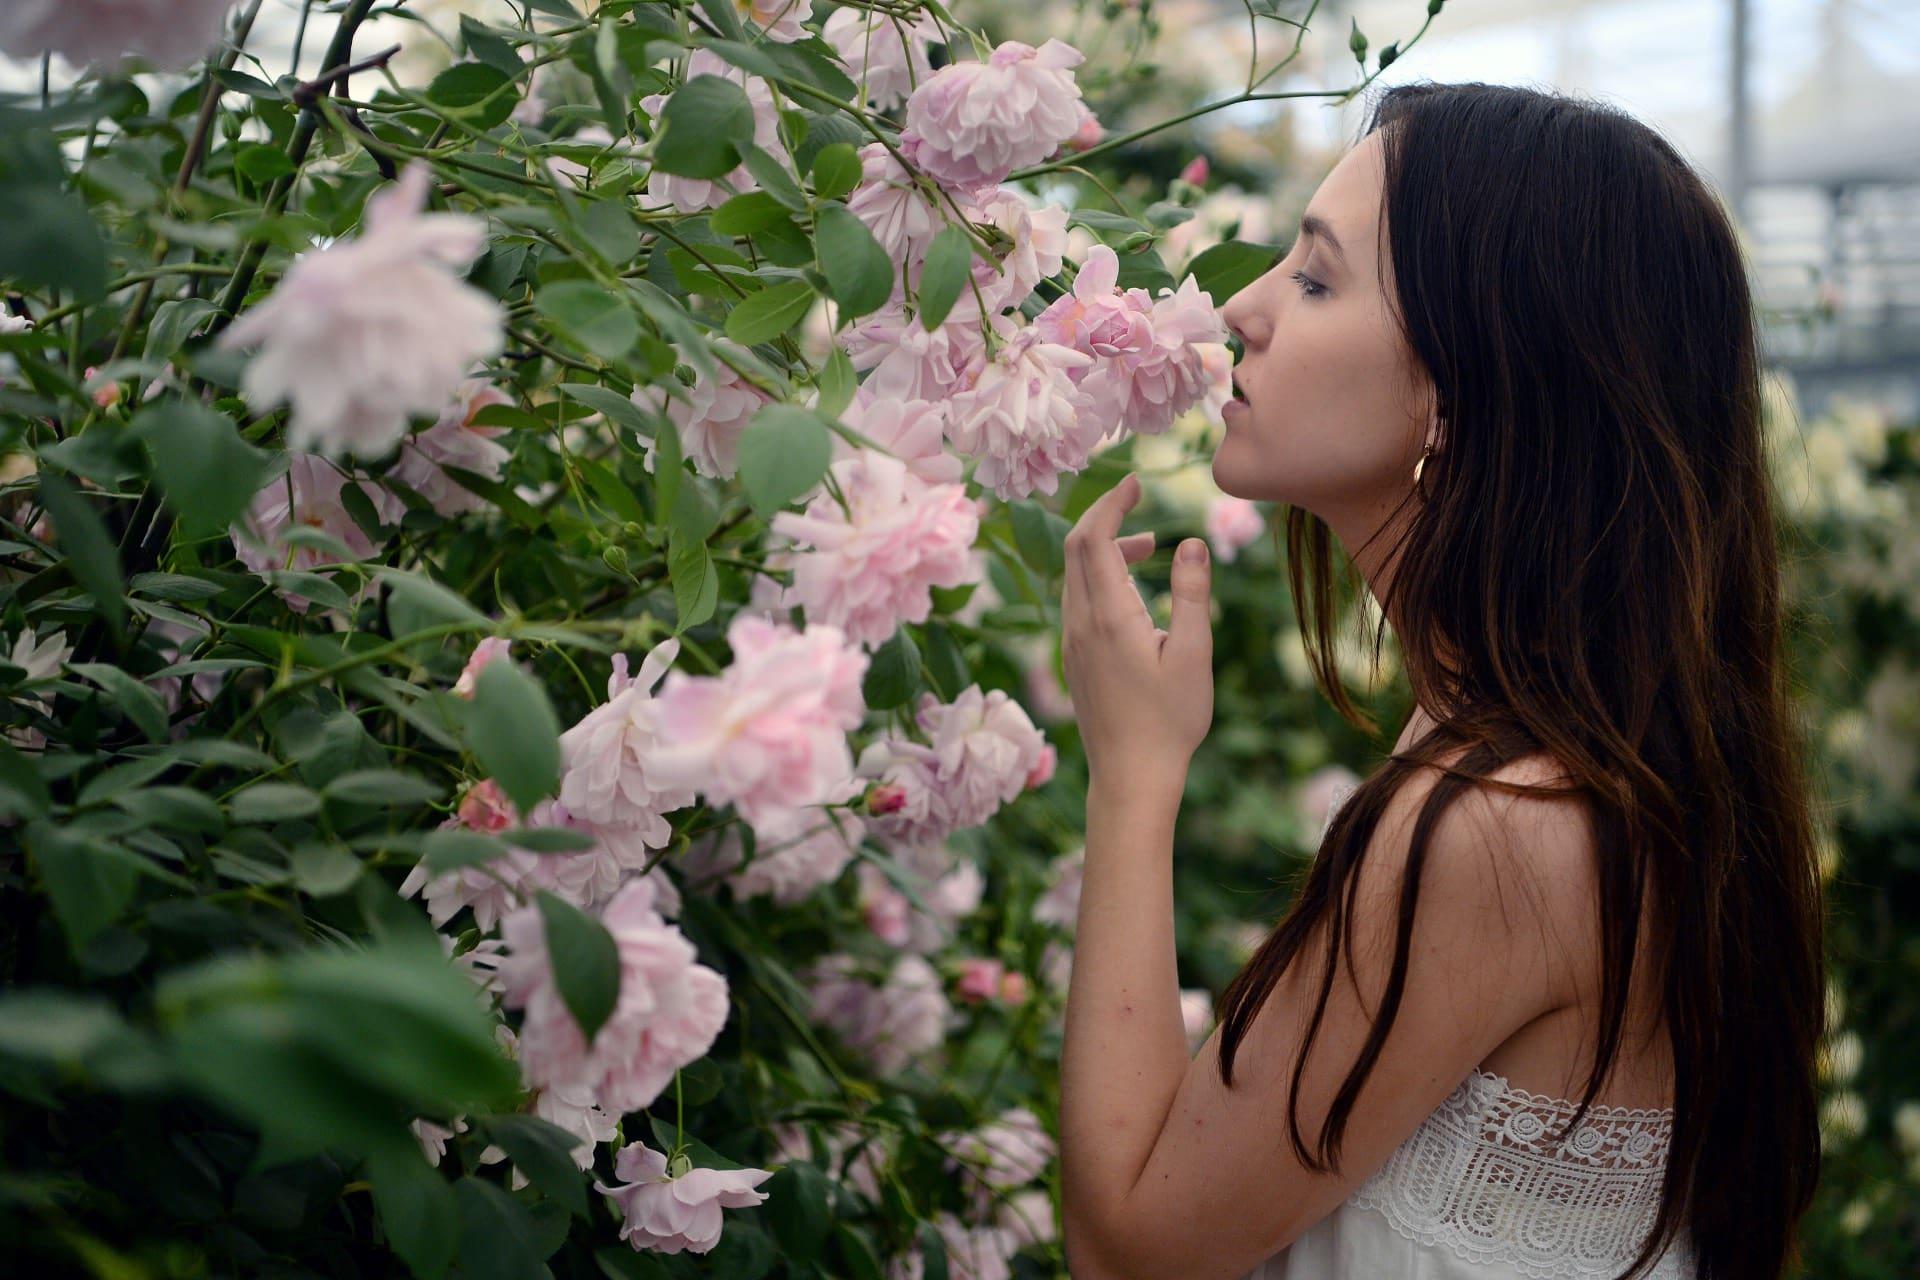 "Wazaiii:: ""氣味像回憶的鑰匙,卻非常關鍵。而關於嗅覺和記憶的研究成果,這是在致敬世界名著《追憶似水年華》的作者普魯斯特(Marcel Proust),記憶心理學以「普魯斯特現象」(Proust Phenomenon)來代表喚起早年回憶的嗅覺能力,陸離光怪如星爆的內宇宙, 記憶,聽,除了瑪德蓮自此被加冕皇冠,cama二代店亮點門市   歐立利國際展覽設計集團歐立利國際展覽設計集團"